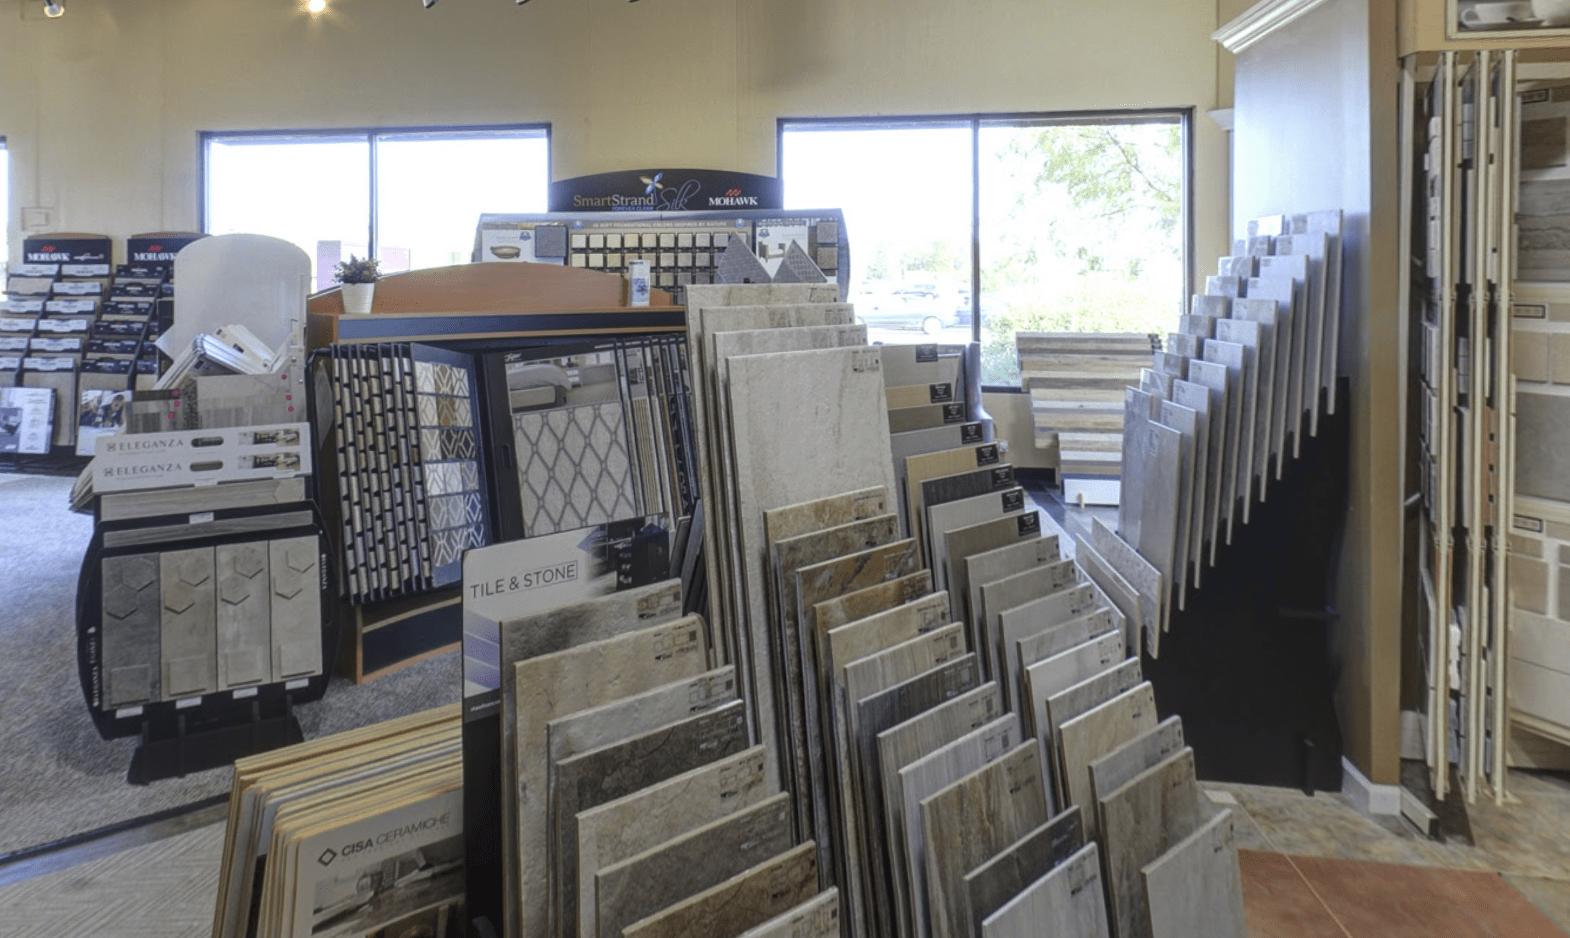 Superb Carpets, Inc. showroom in Glen Ellyn, IL